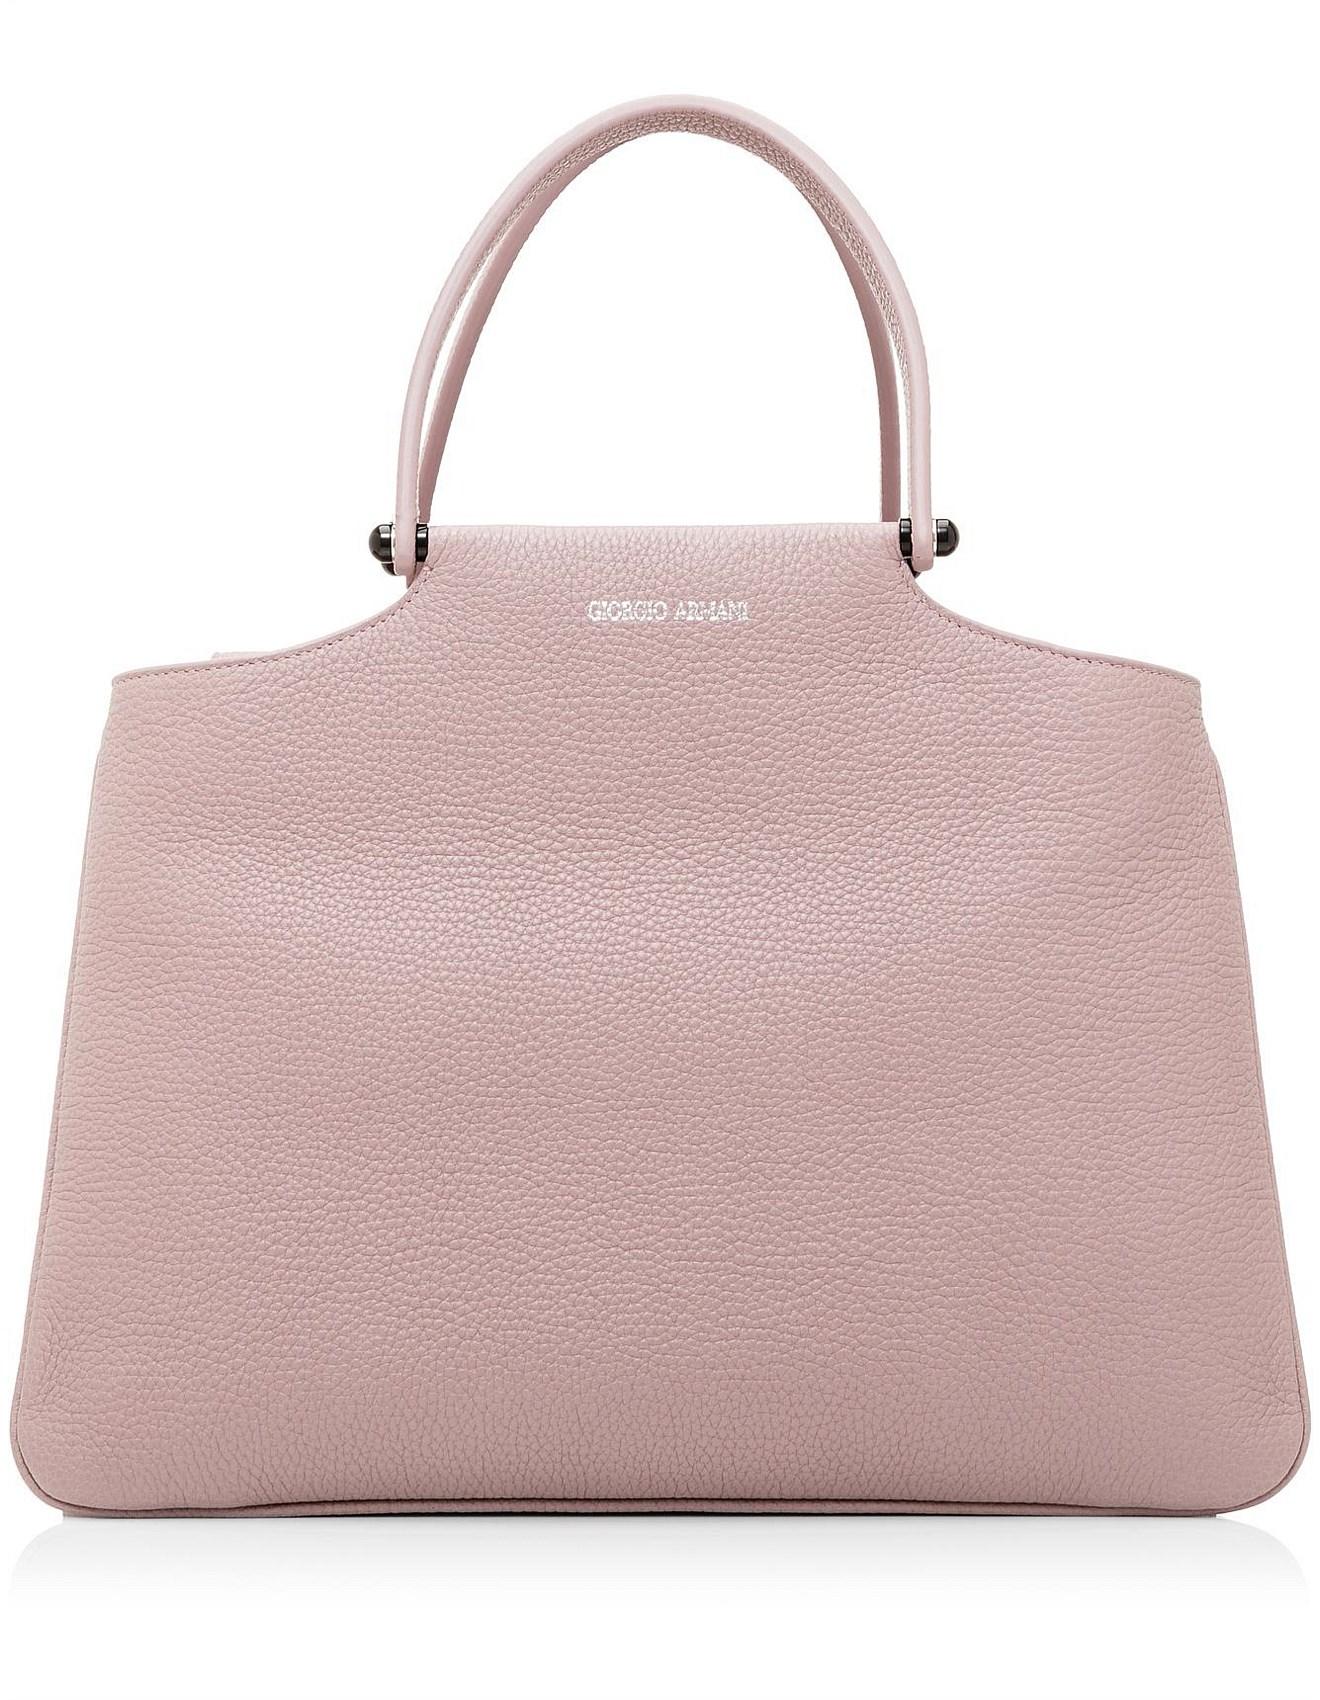 218b9296370 FENICE SMALL SHOPPING BAG